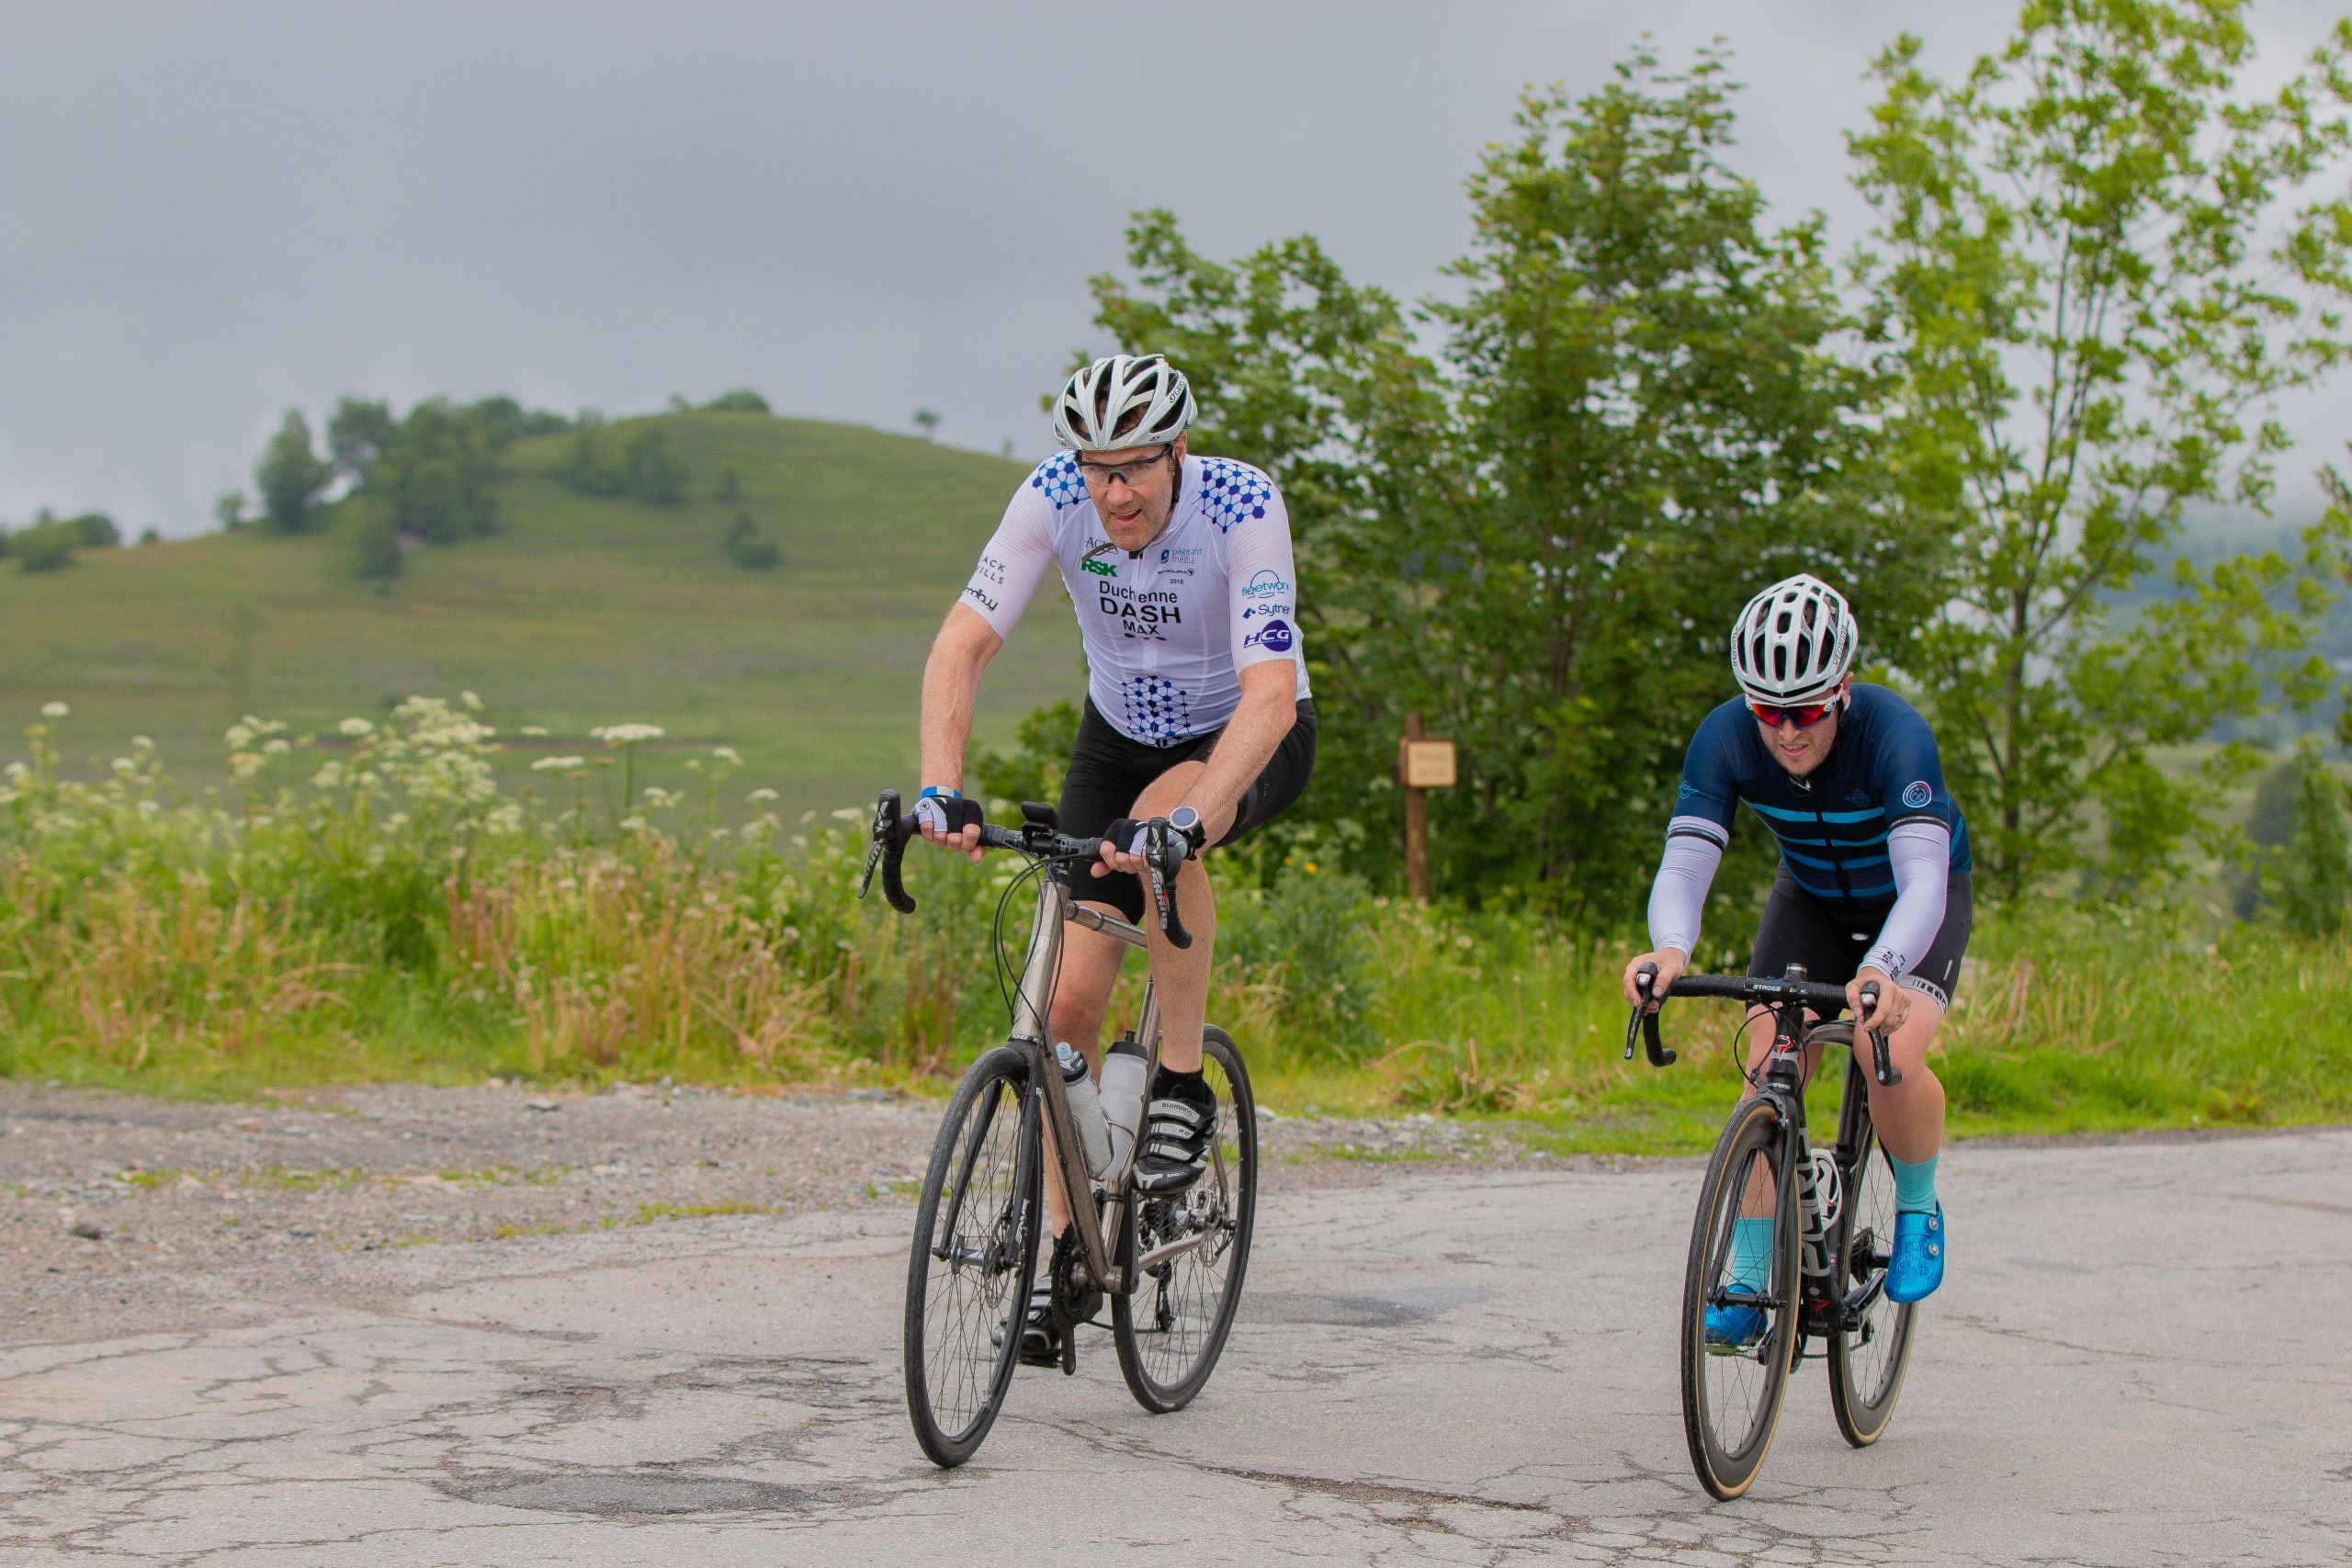 Riders on the Duchenne Dash MAX 2018